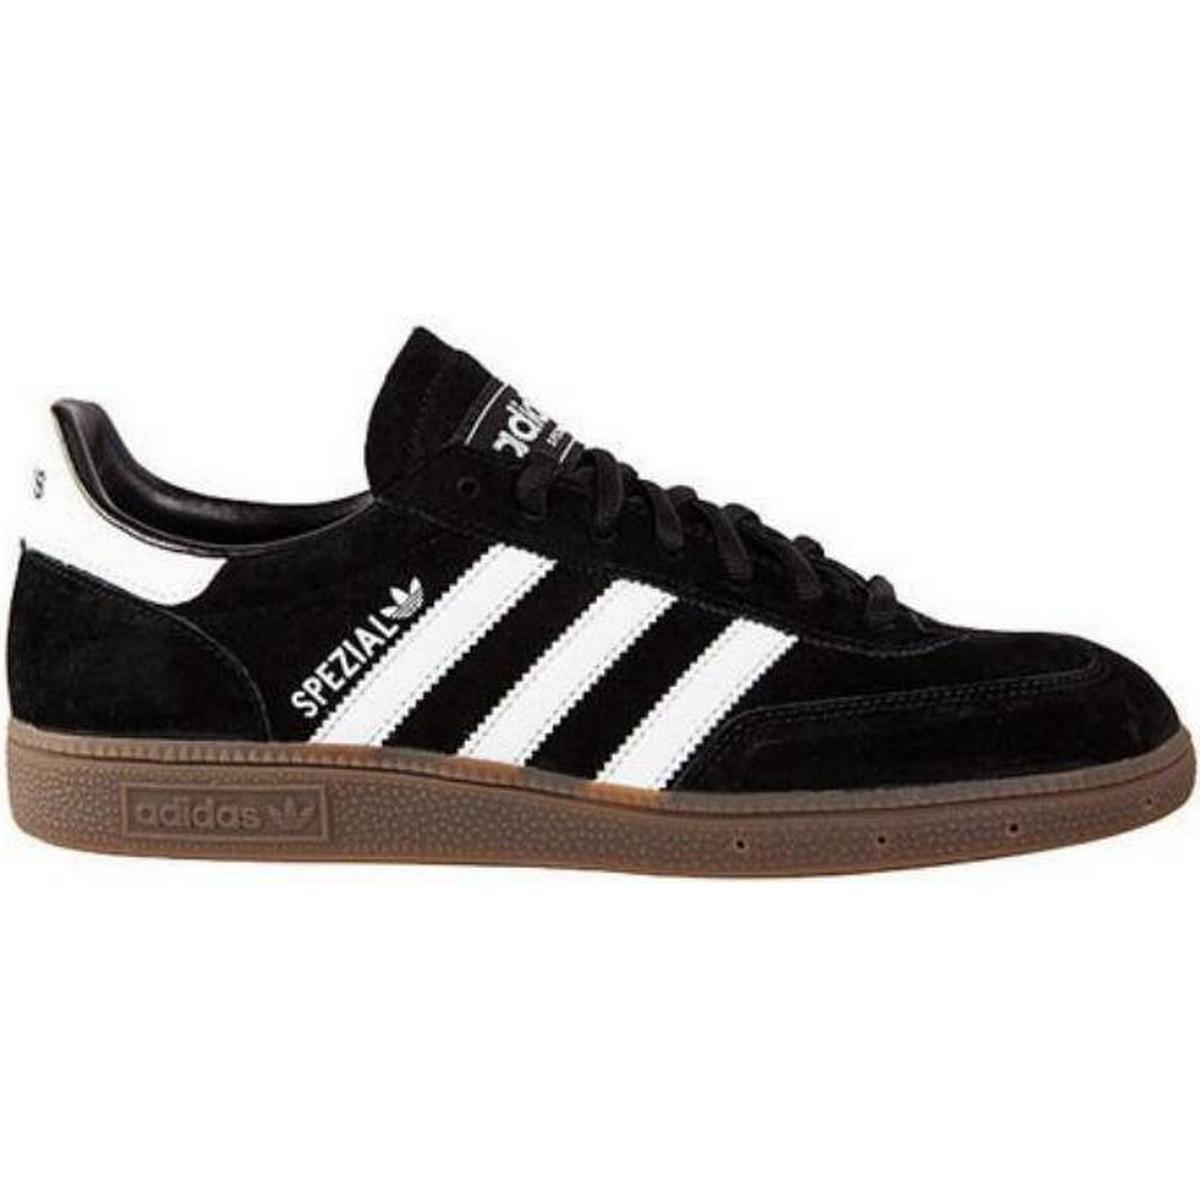 d1454c3f706 Adidas Sko - Sammenlign priser hos PriceRunner